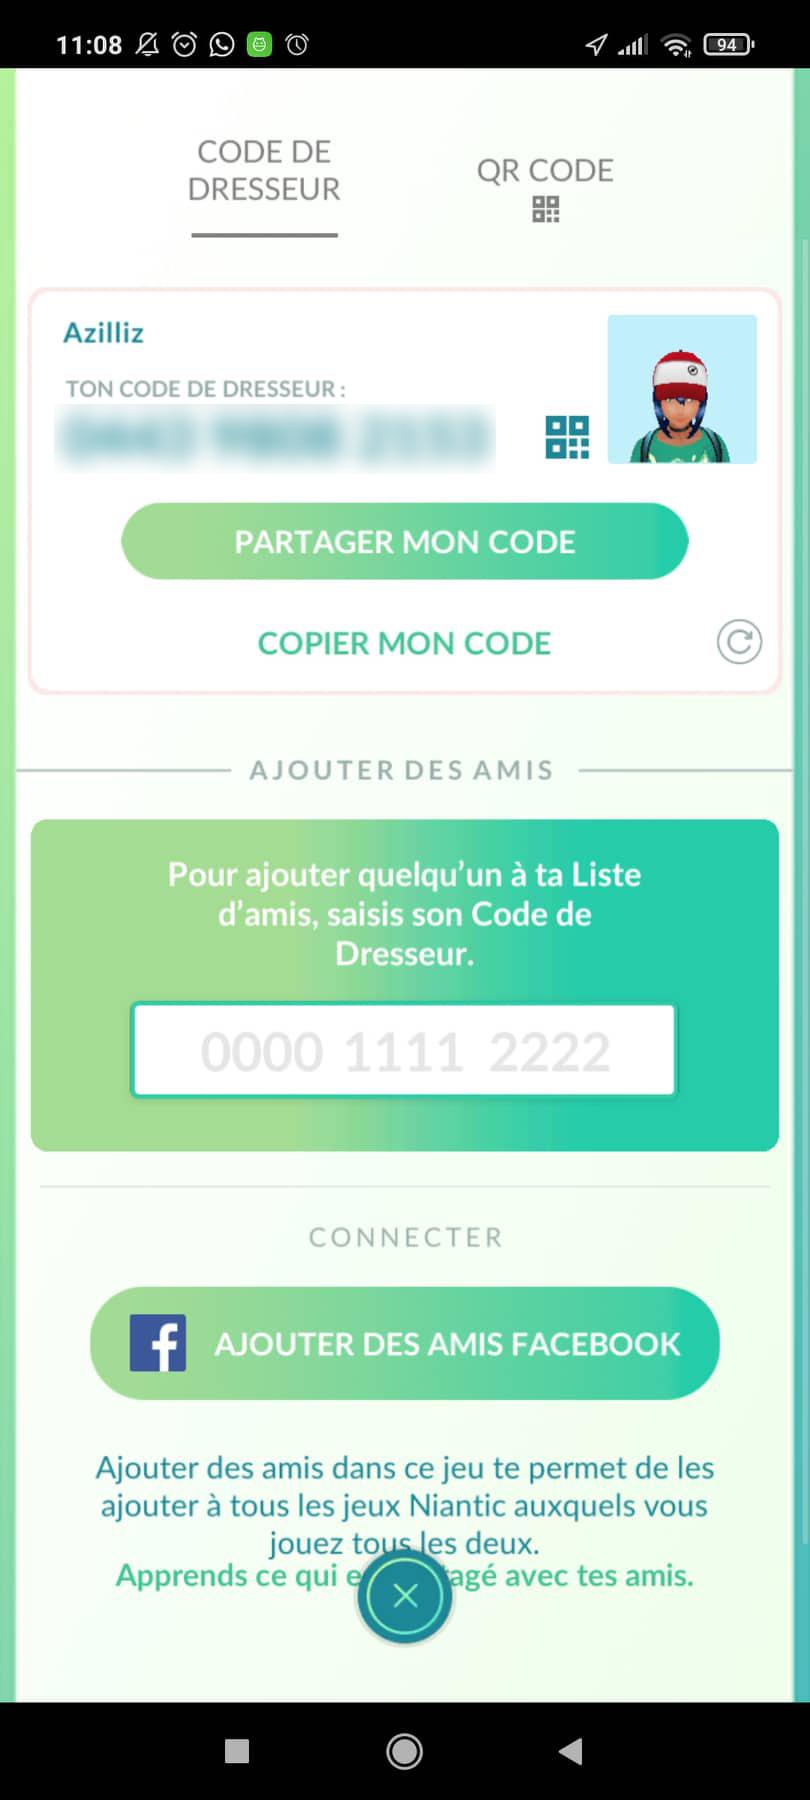 pokemon-go-ajouter-des-amis